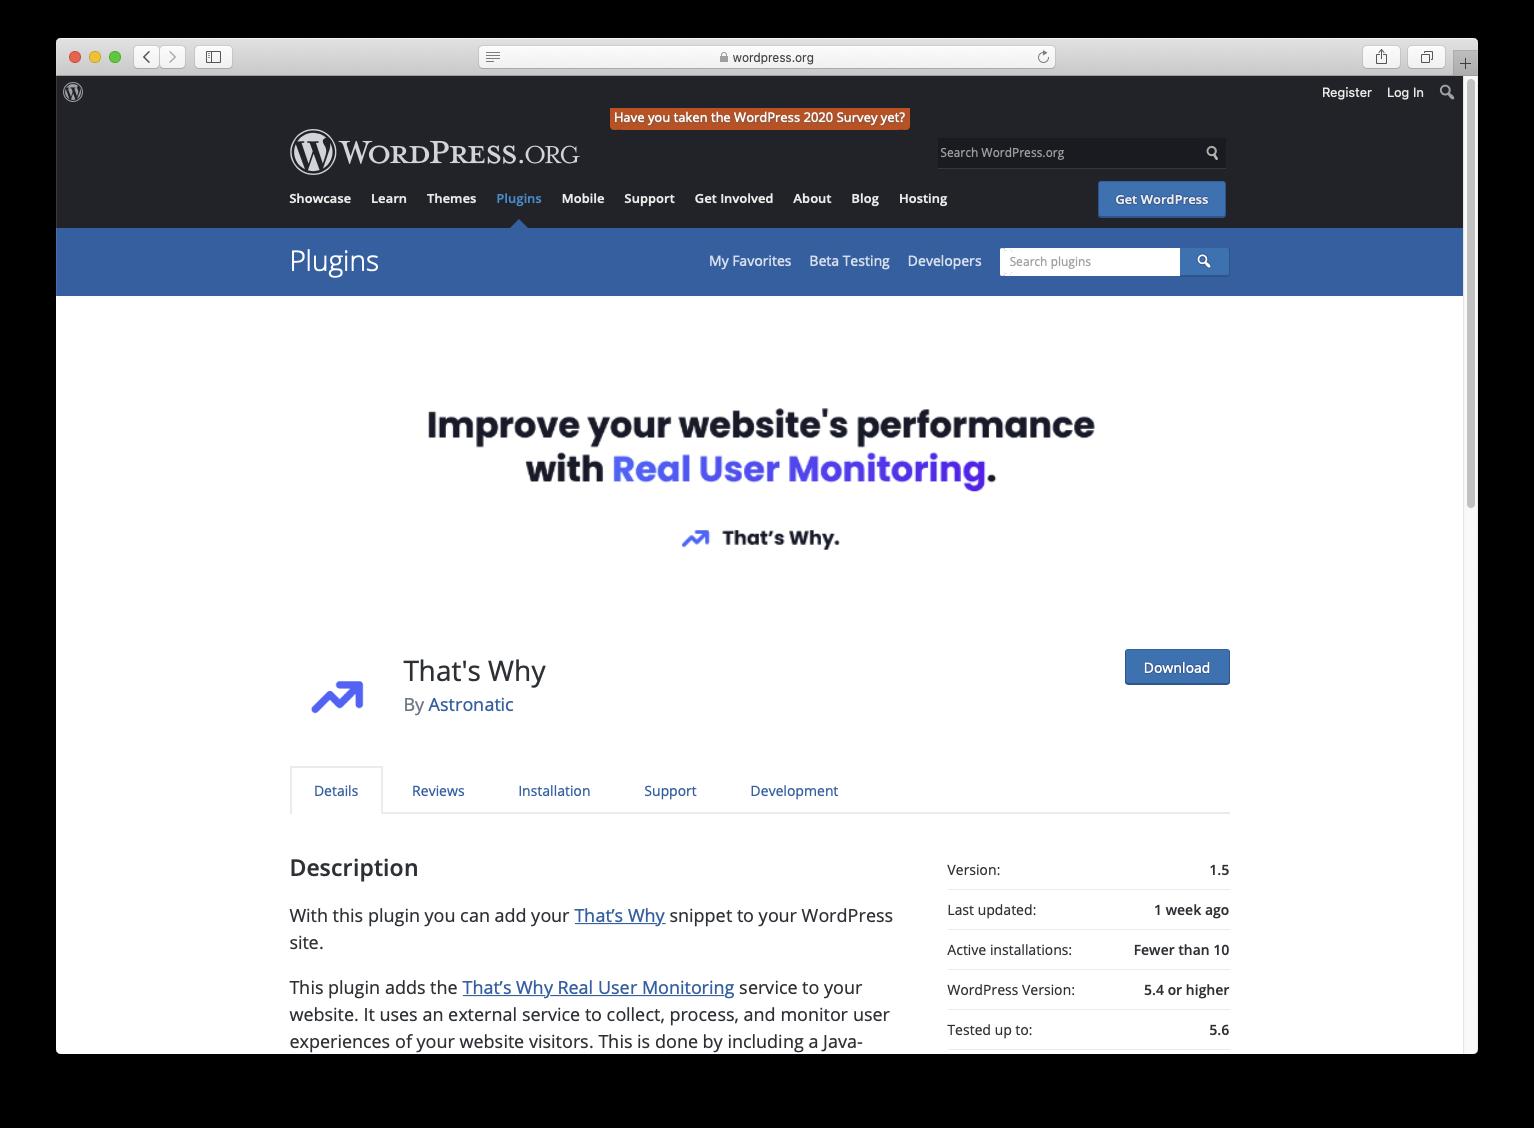 Wordpress.org That's Why Real User Monitoring plugin